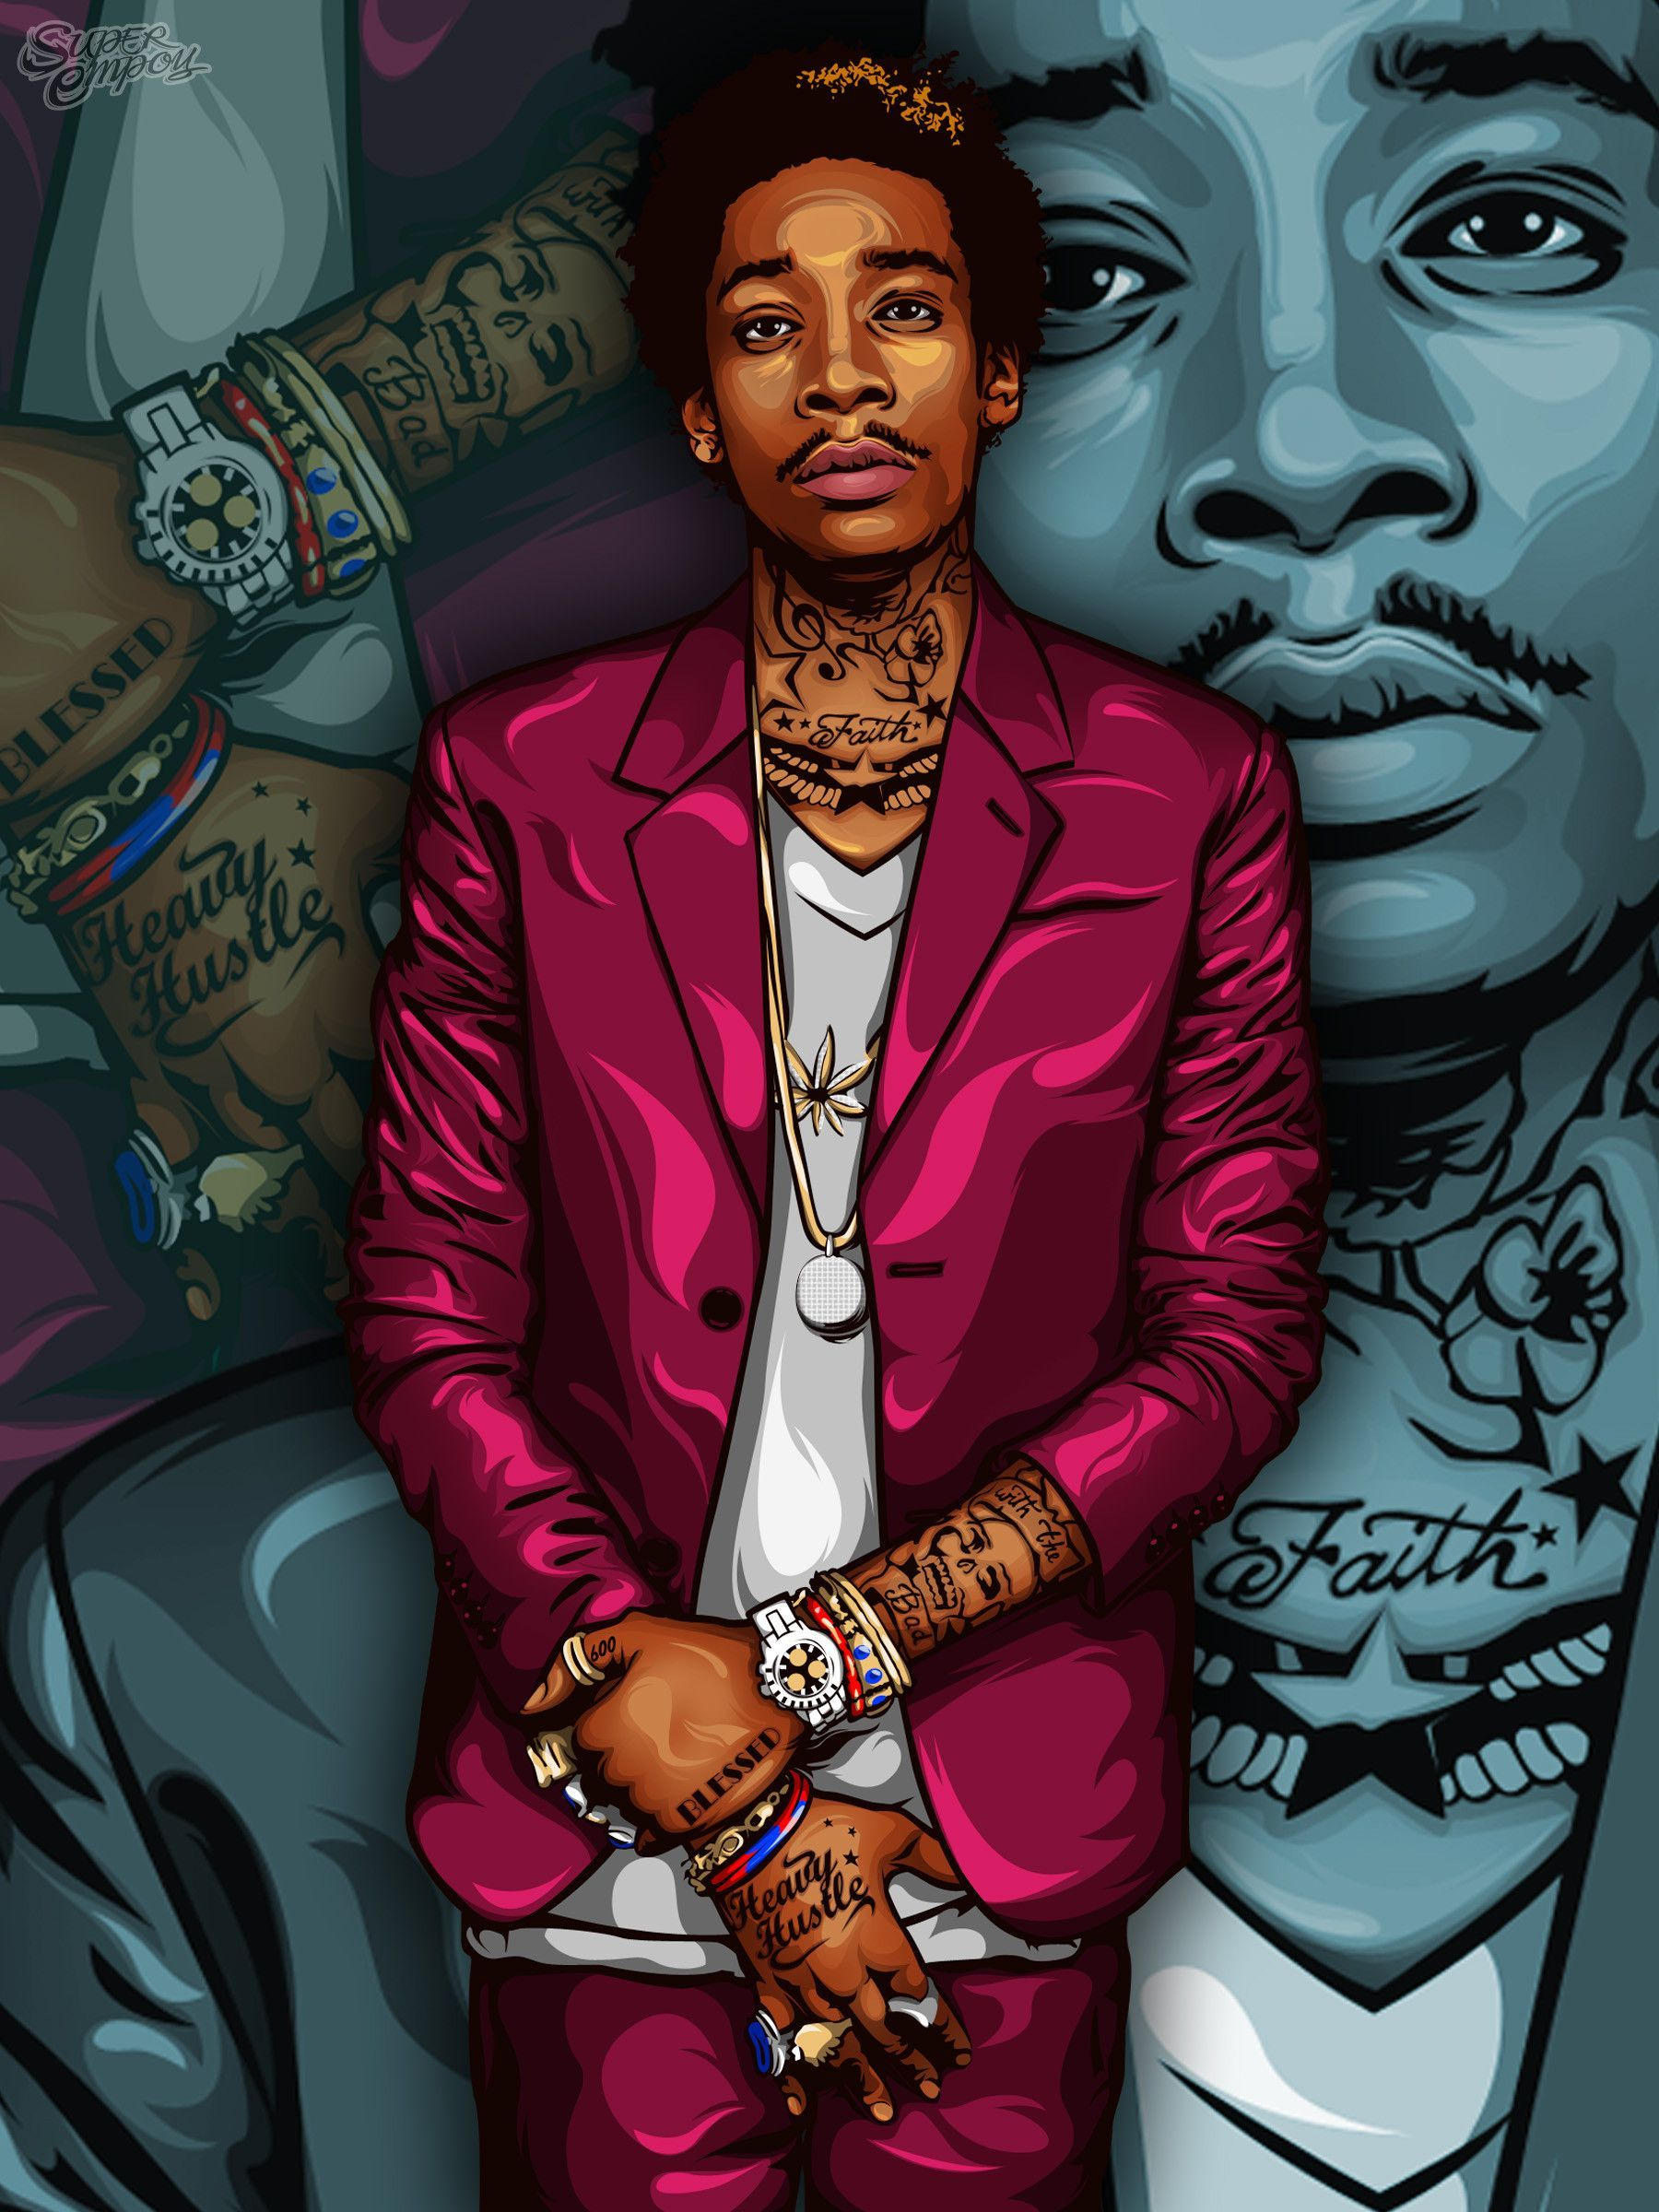 Wiz Khalifa Cartoon Wallpapers Top Free Wiz Khalifa Cartoon Backgrounds Wallpaperaccess The Wiz Wiz Khalifa Hip Hop Art